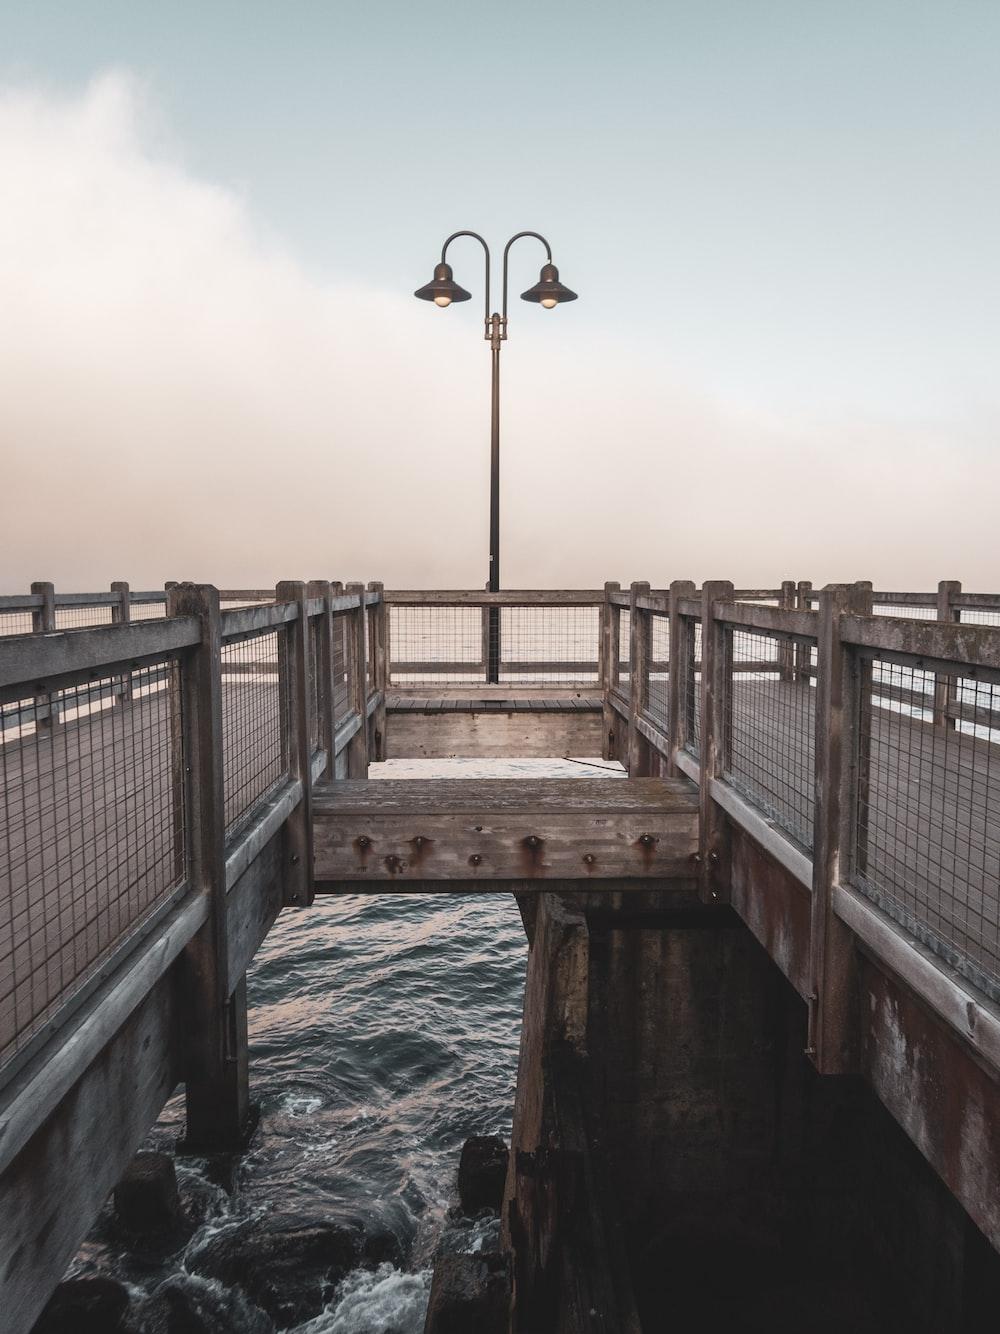 brown wooden bridge over water during daytime